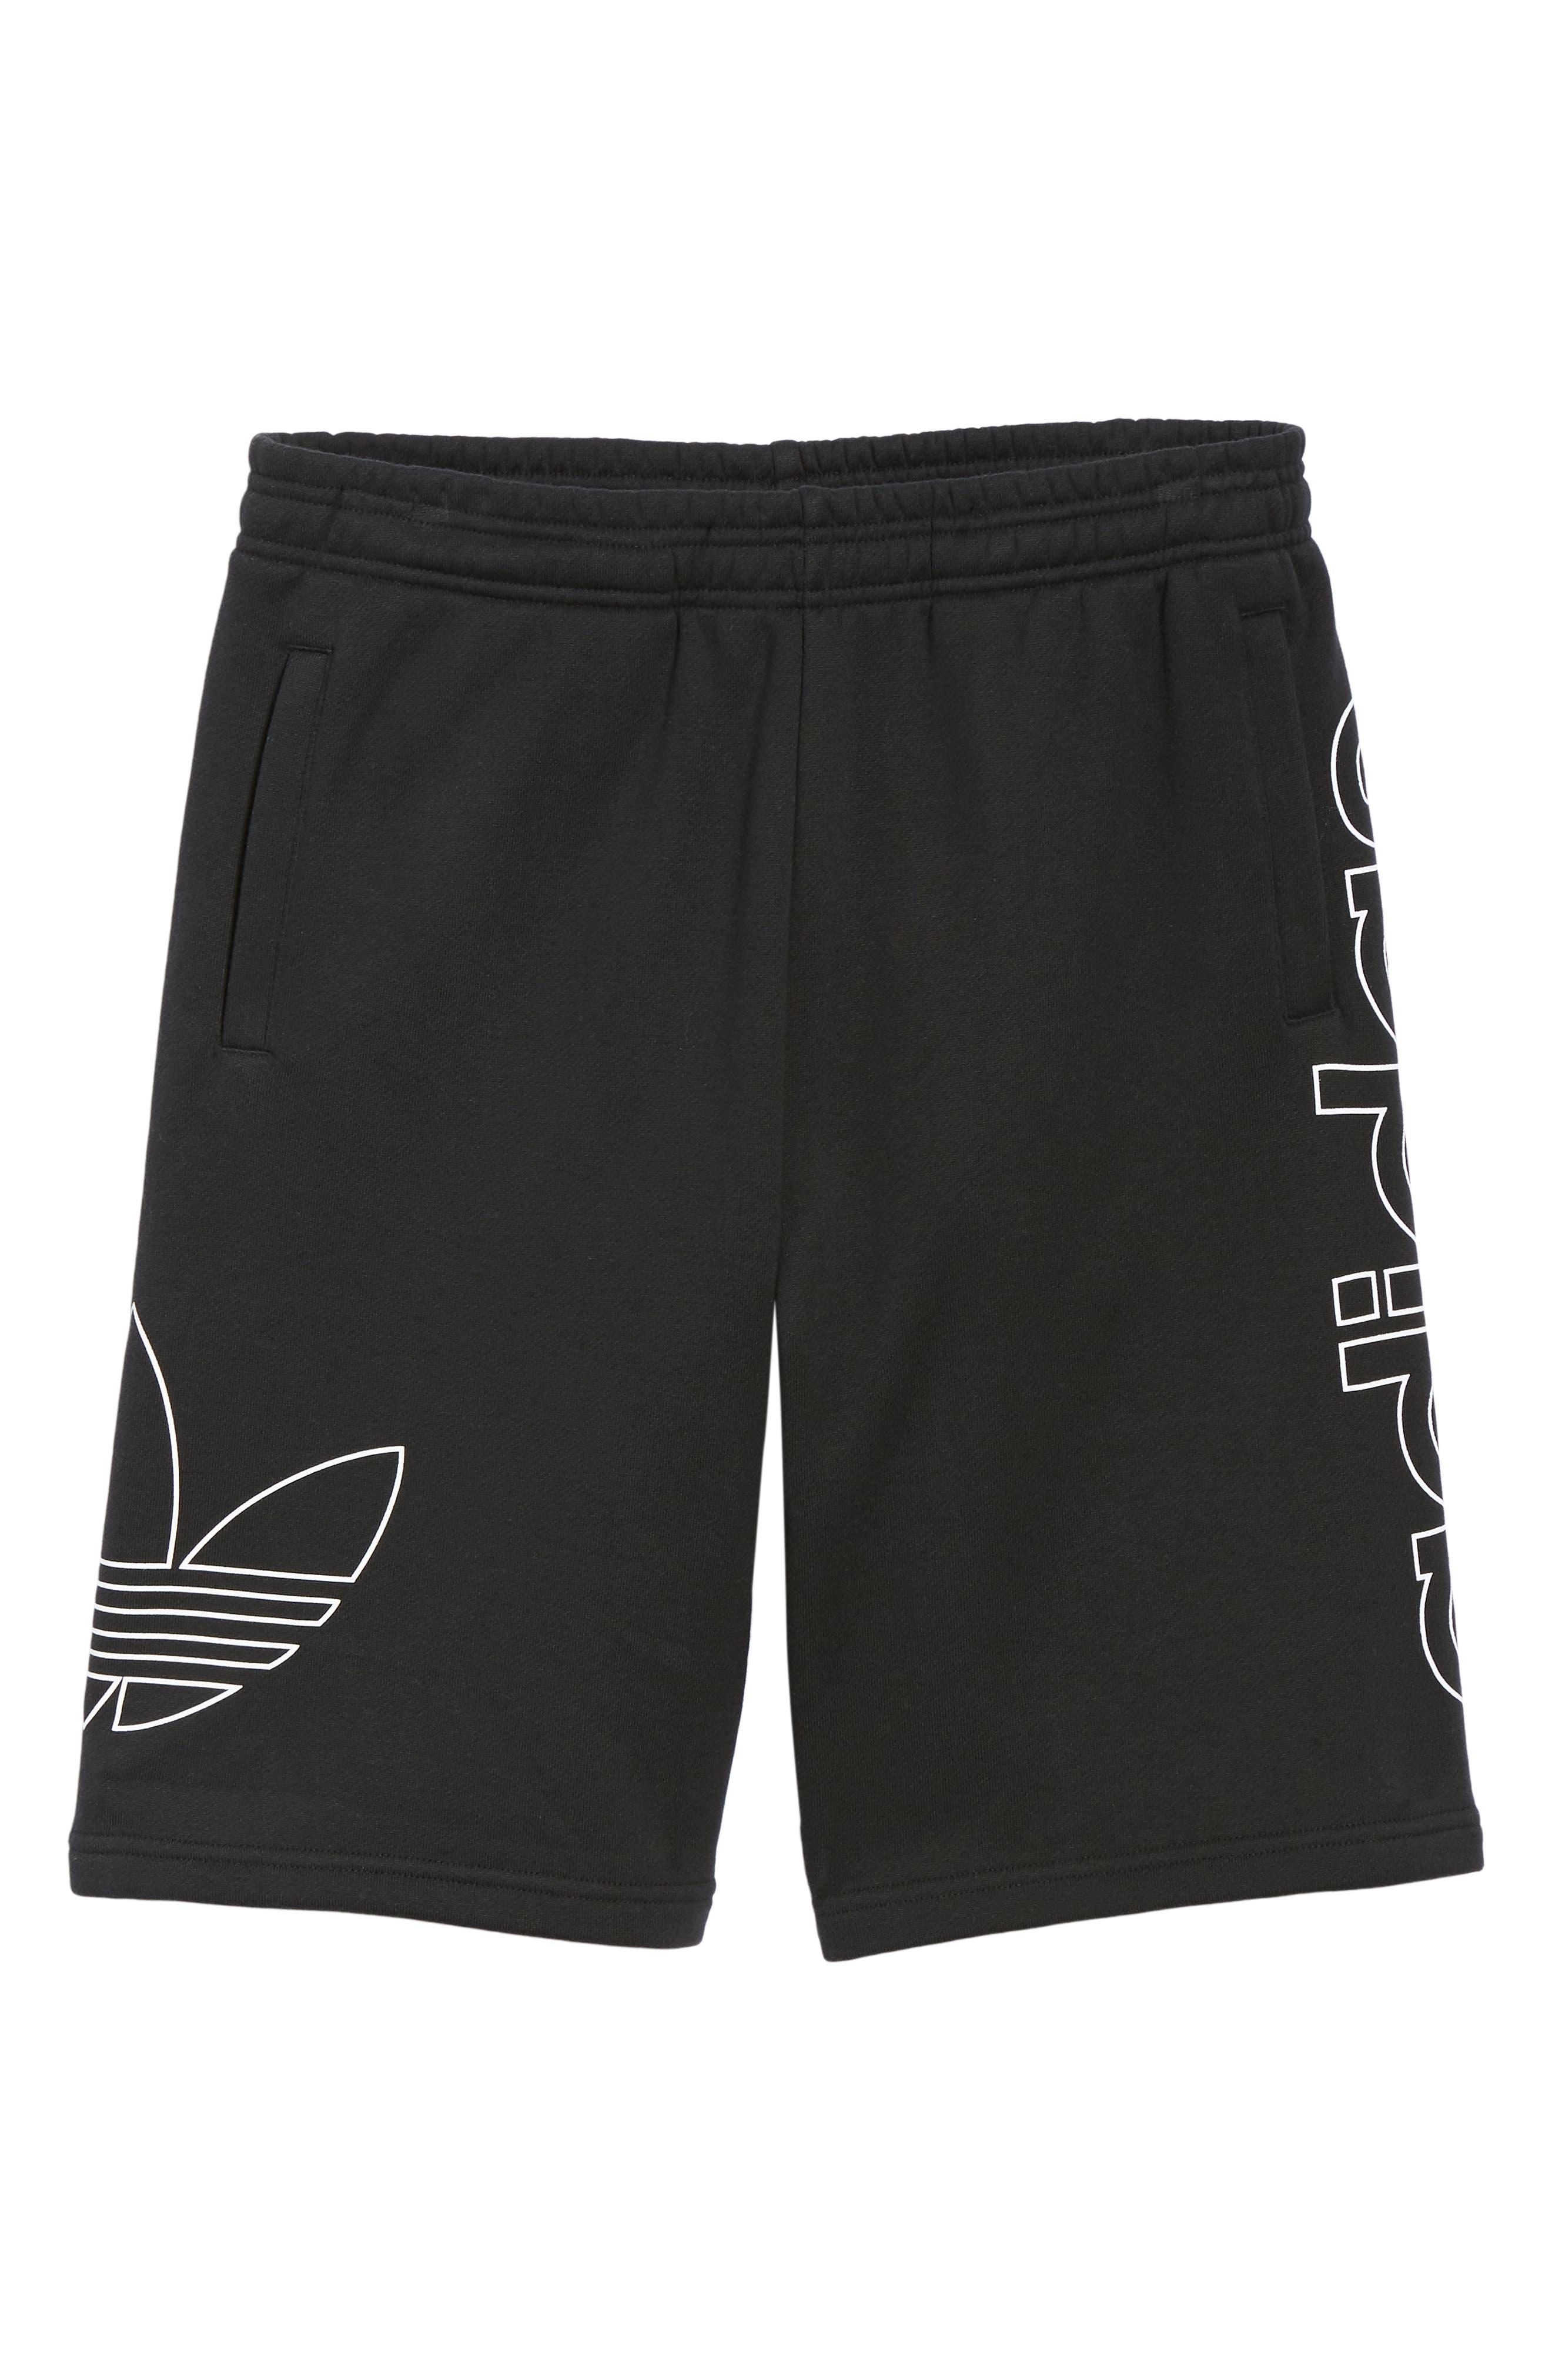 ADIDAS ORIGINALS, FT OTLN Athletic Shorts, Alternate thumbnail 6, color, BLACK/ WHITE